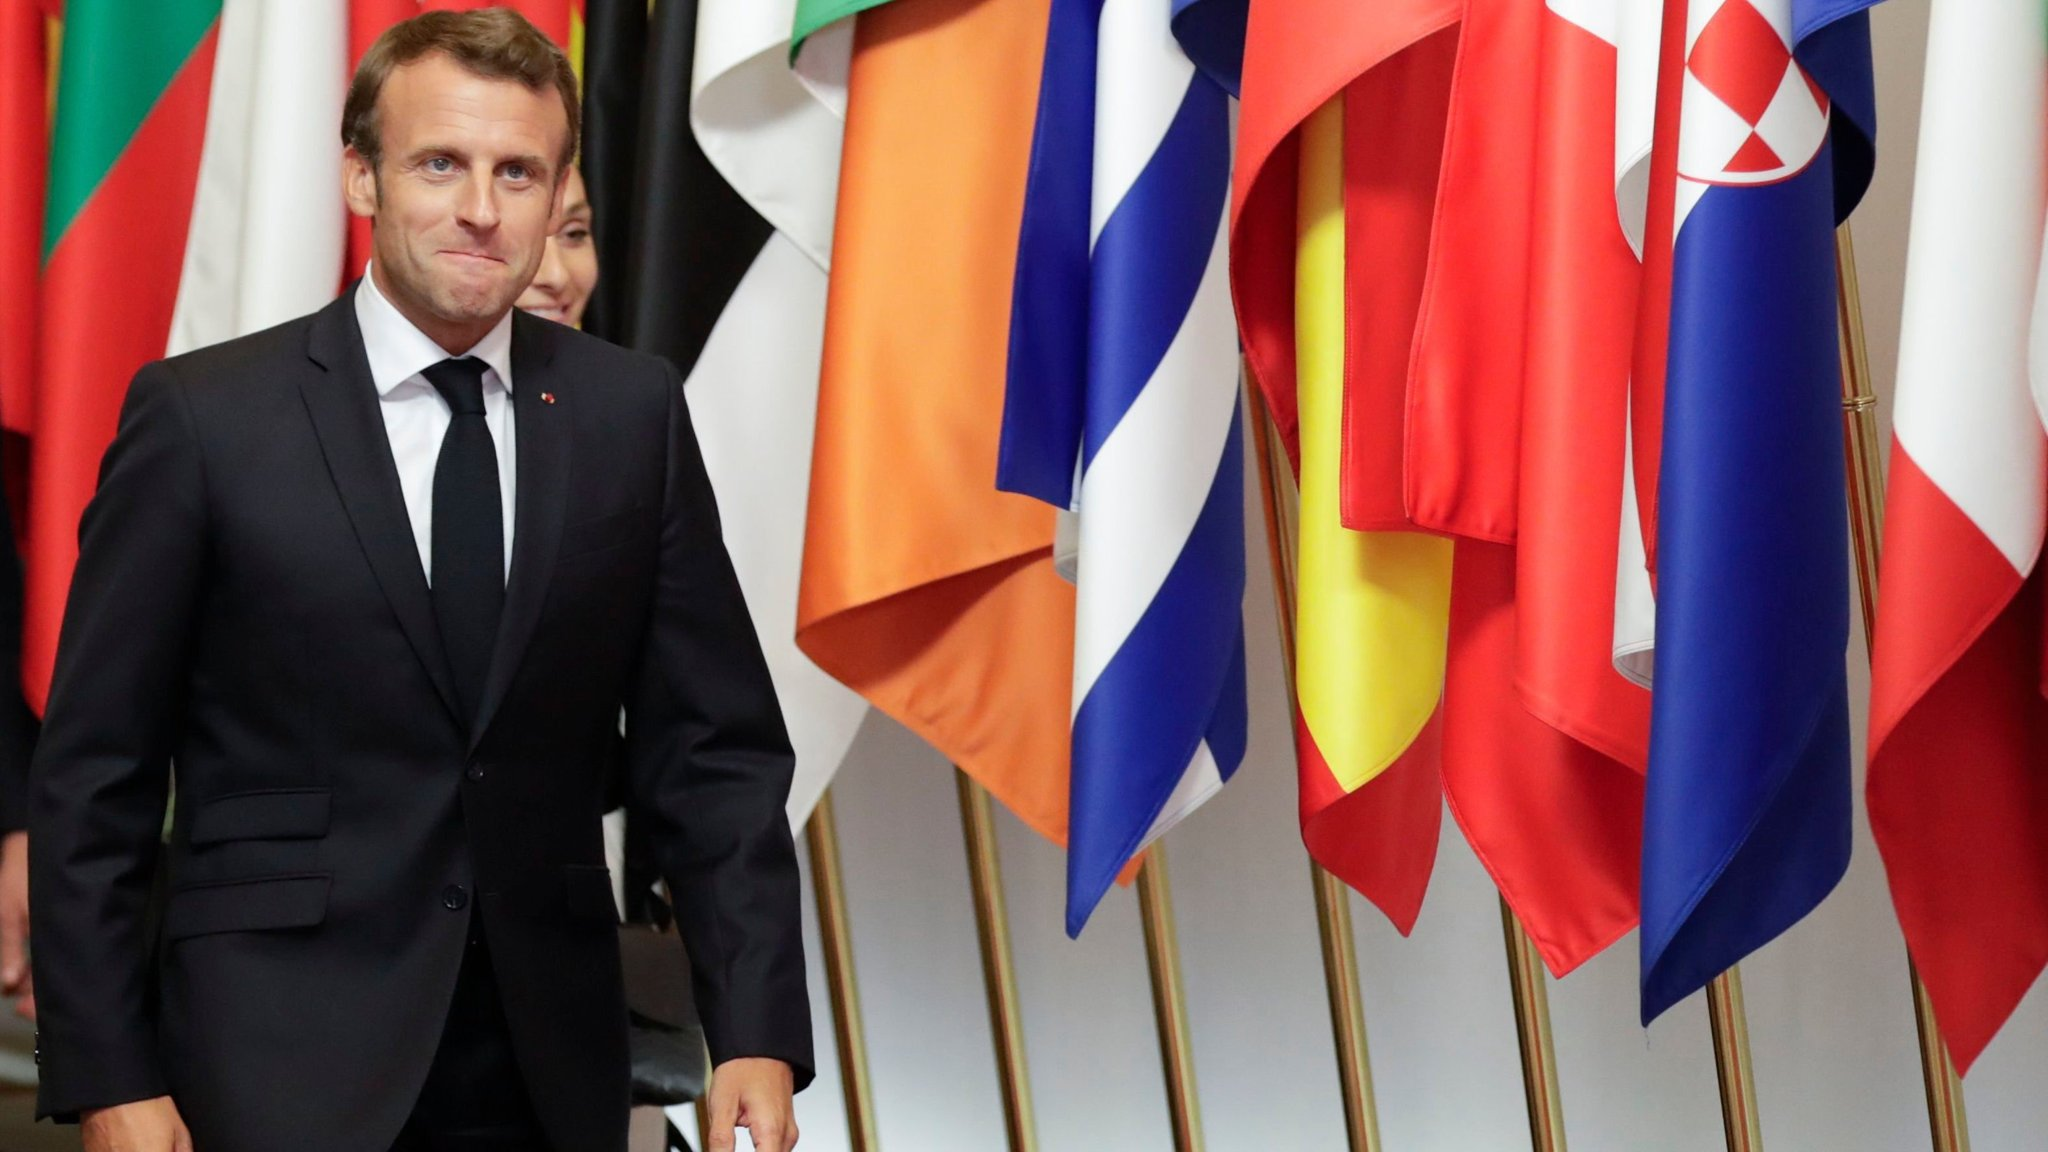 EU summit ends in deadlock over filling top jobs